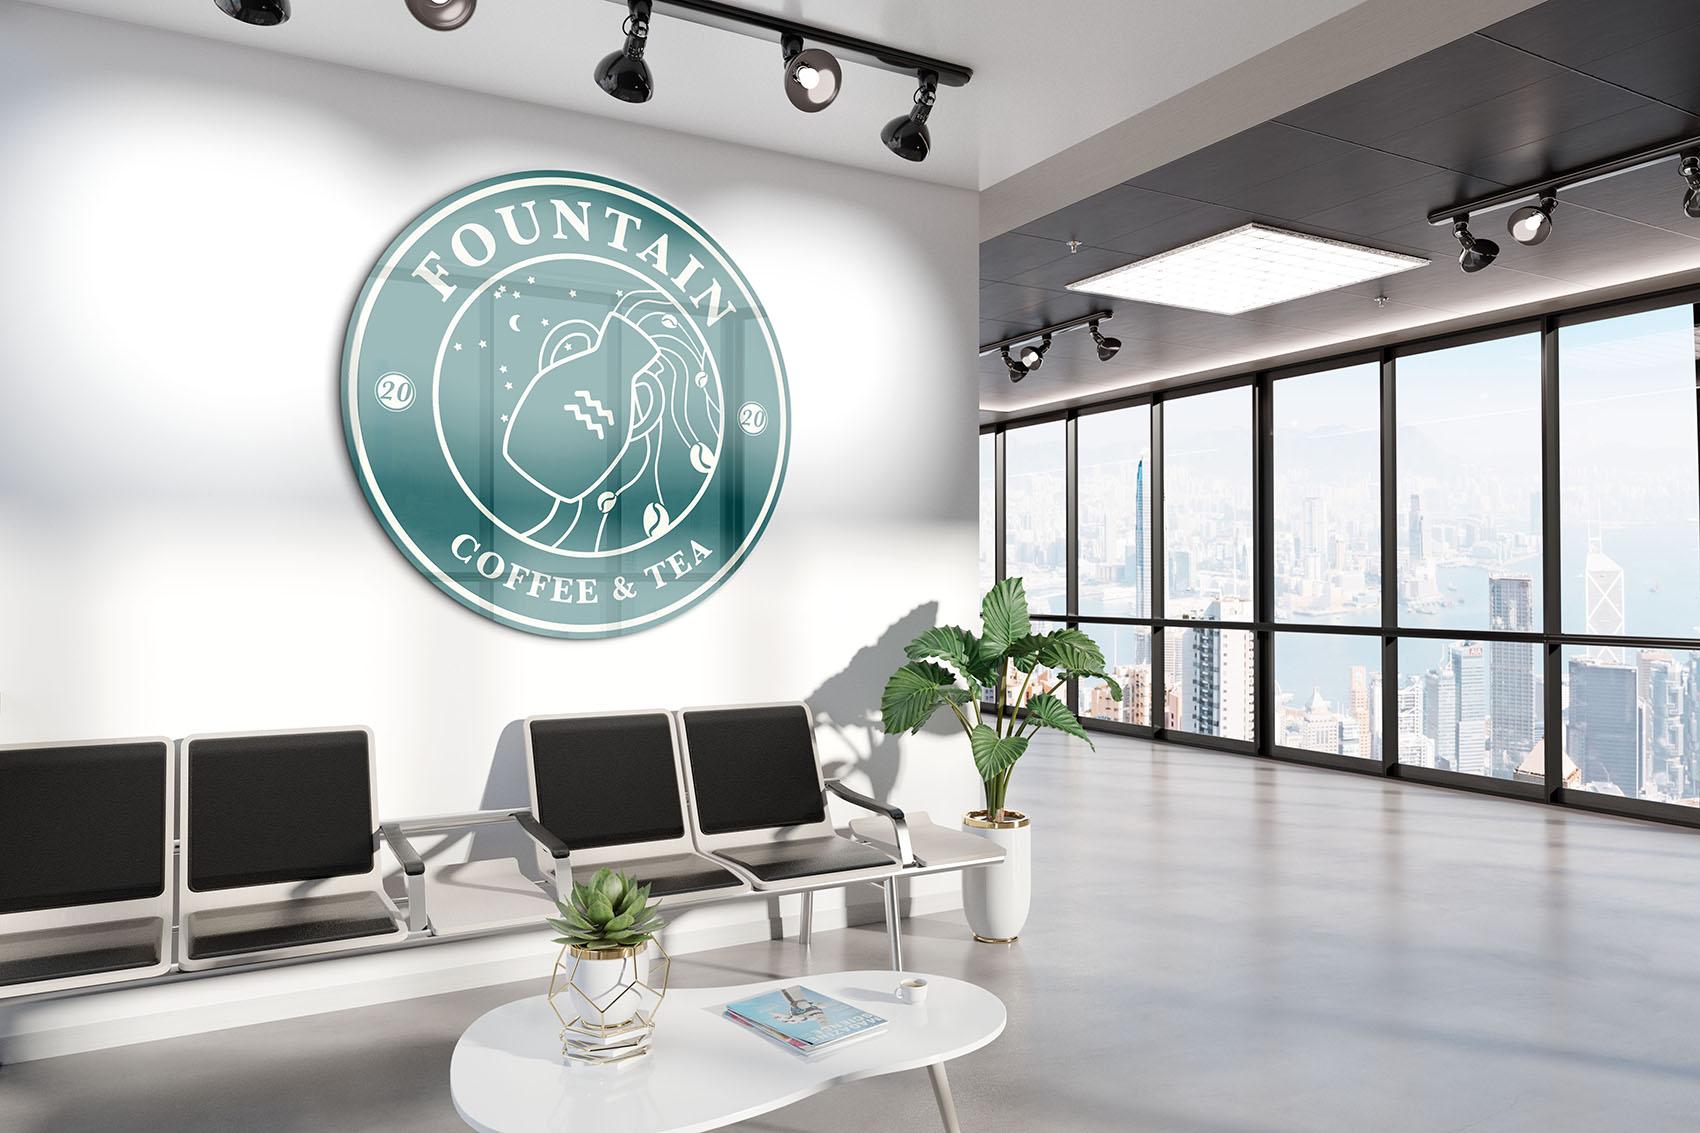 Sample office wall logo